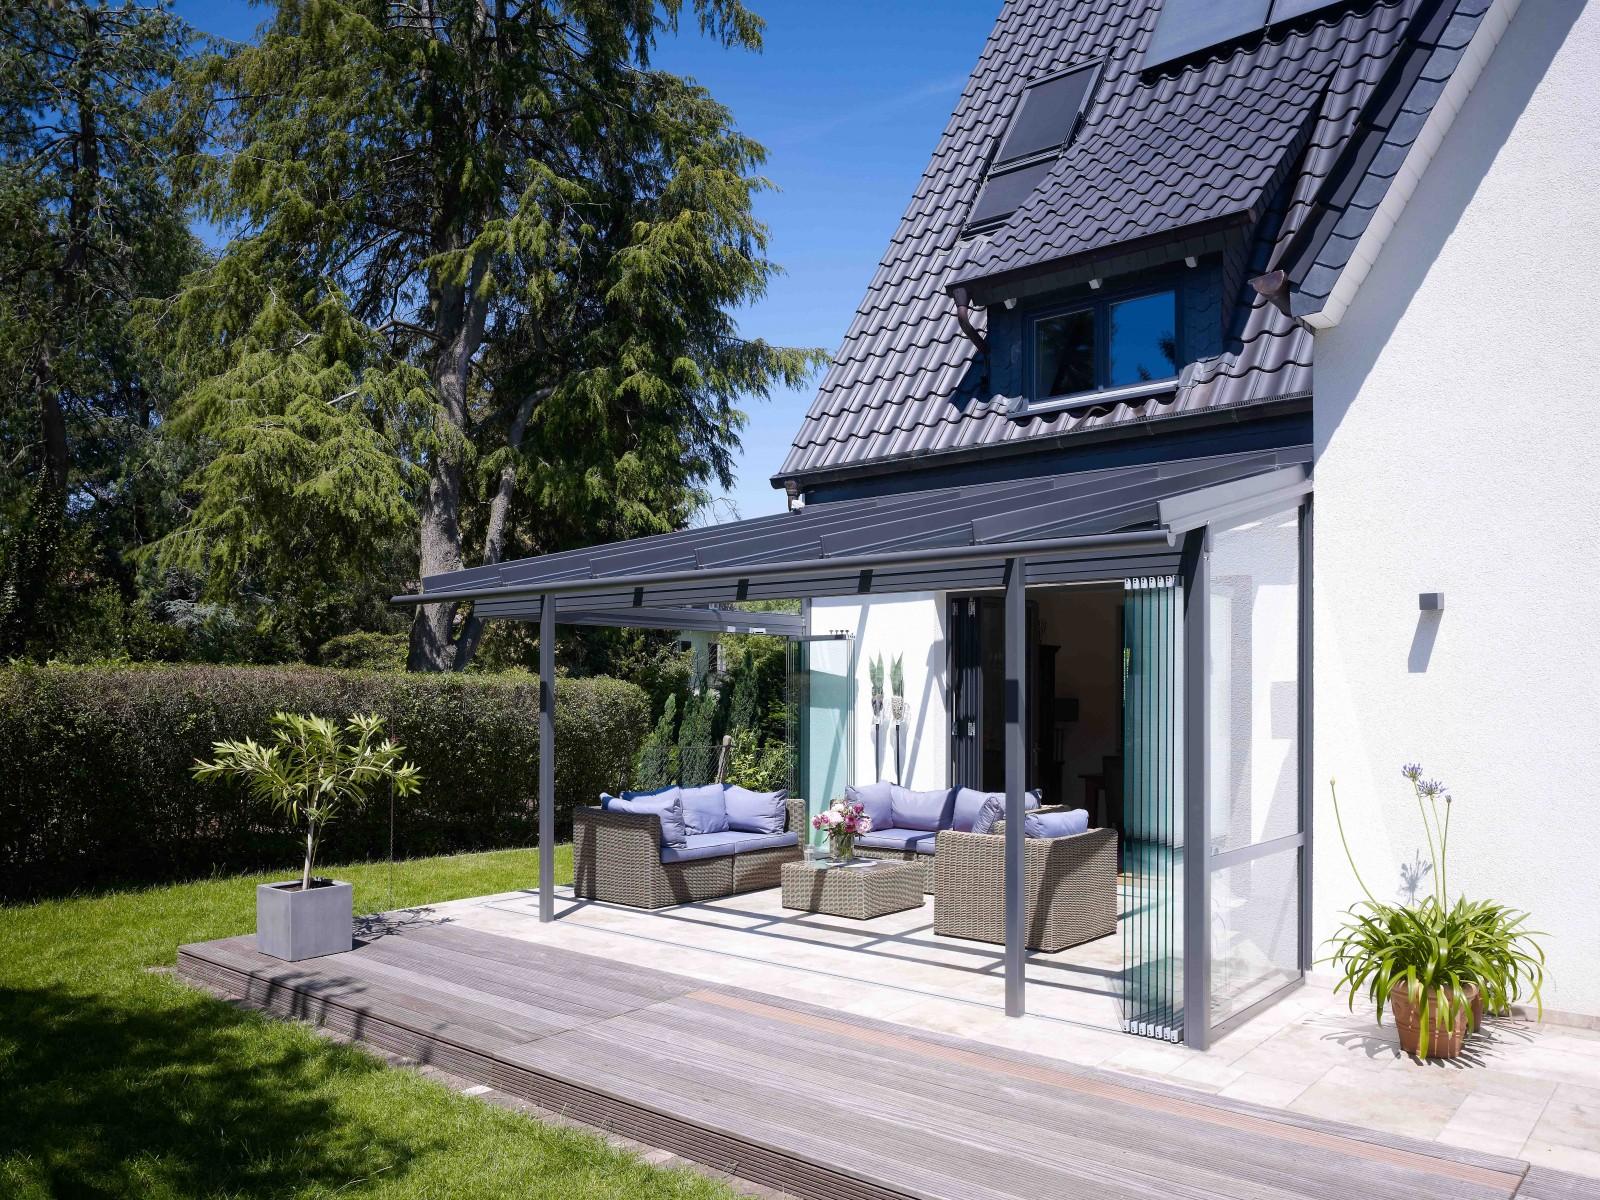 pergola vitr e solarlux. Black Bedroom Furniture Sets. Home Design Ideas